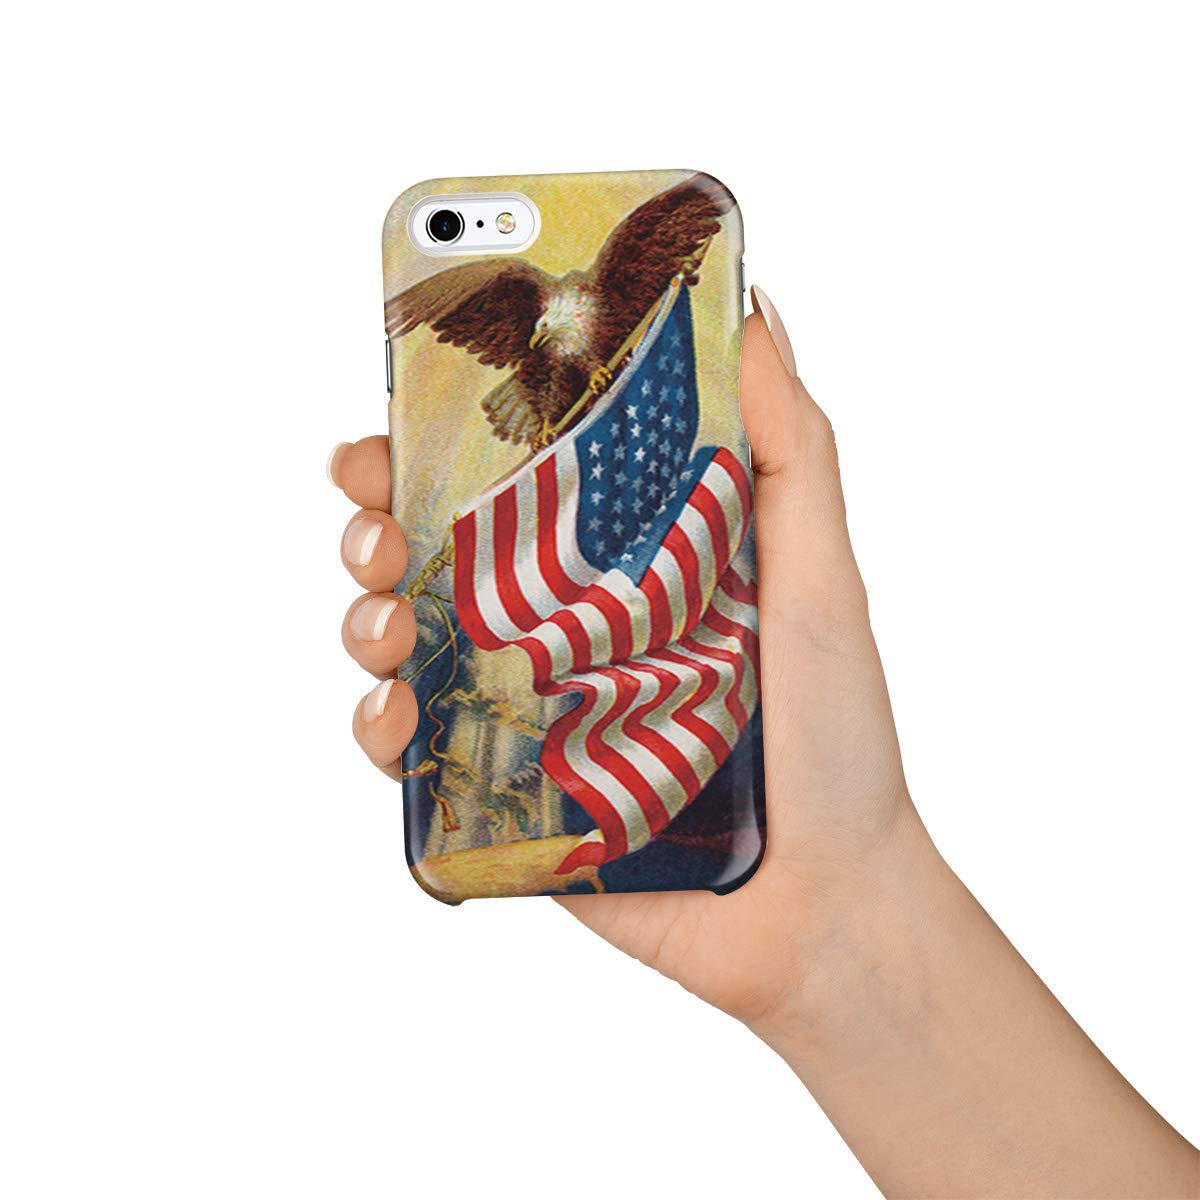 Amazon com: YEHO Art Gallery Christmas Phone Case Protective